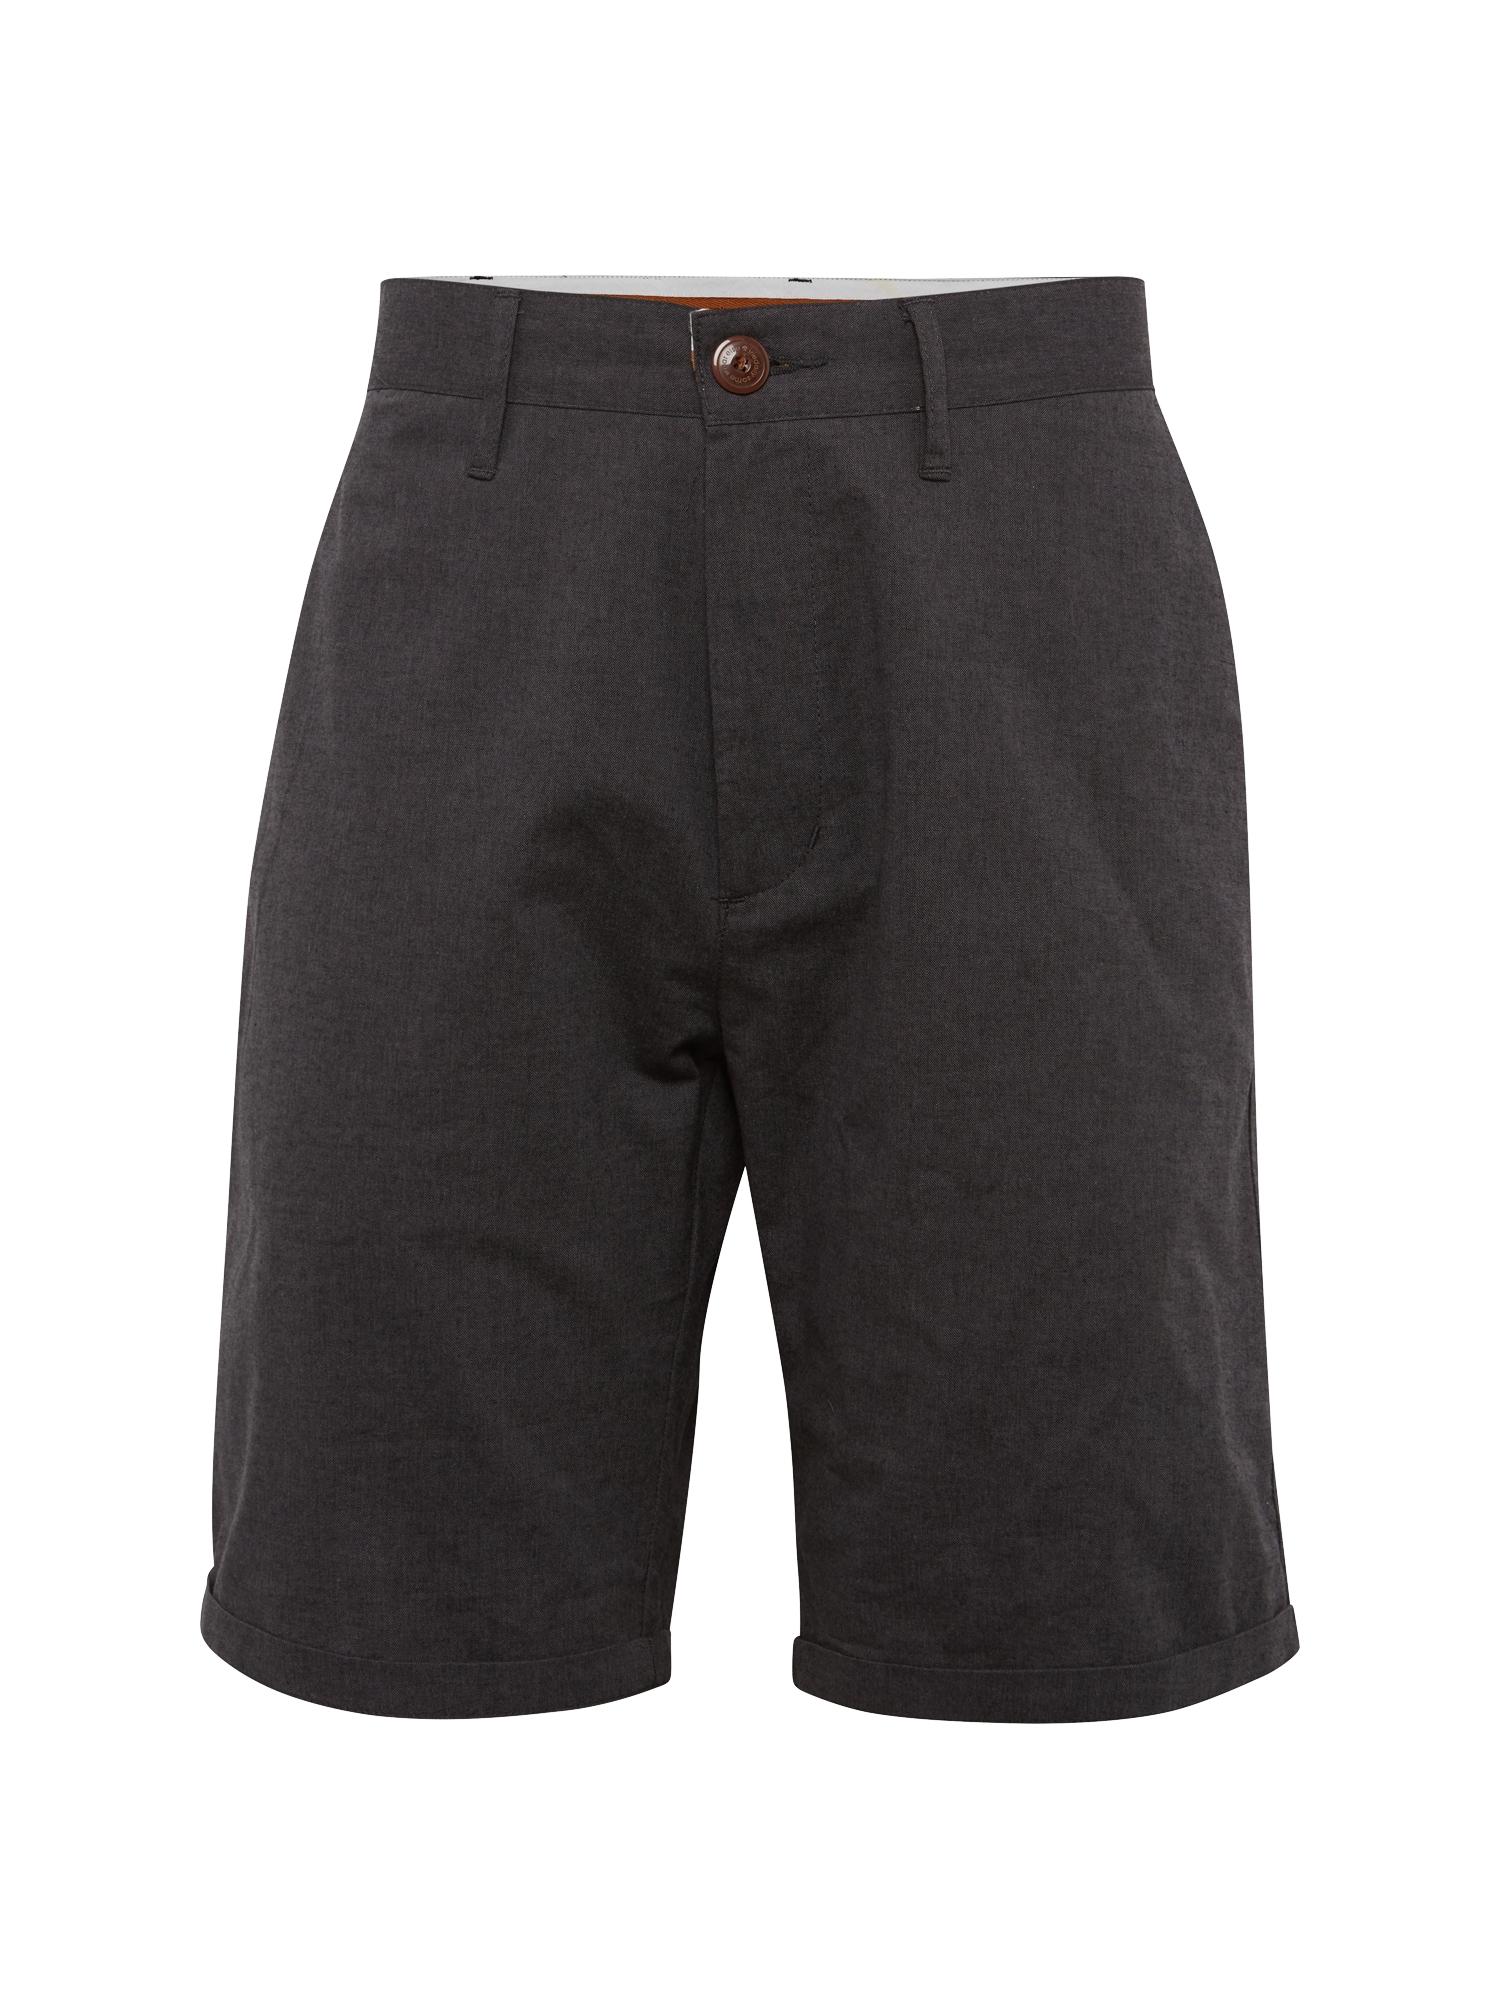 Iriedaily Kelnės 'Golfer Chambray' tamsiai pilka